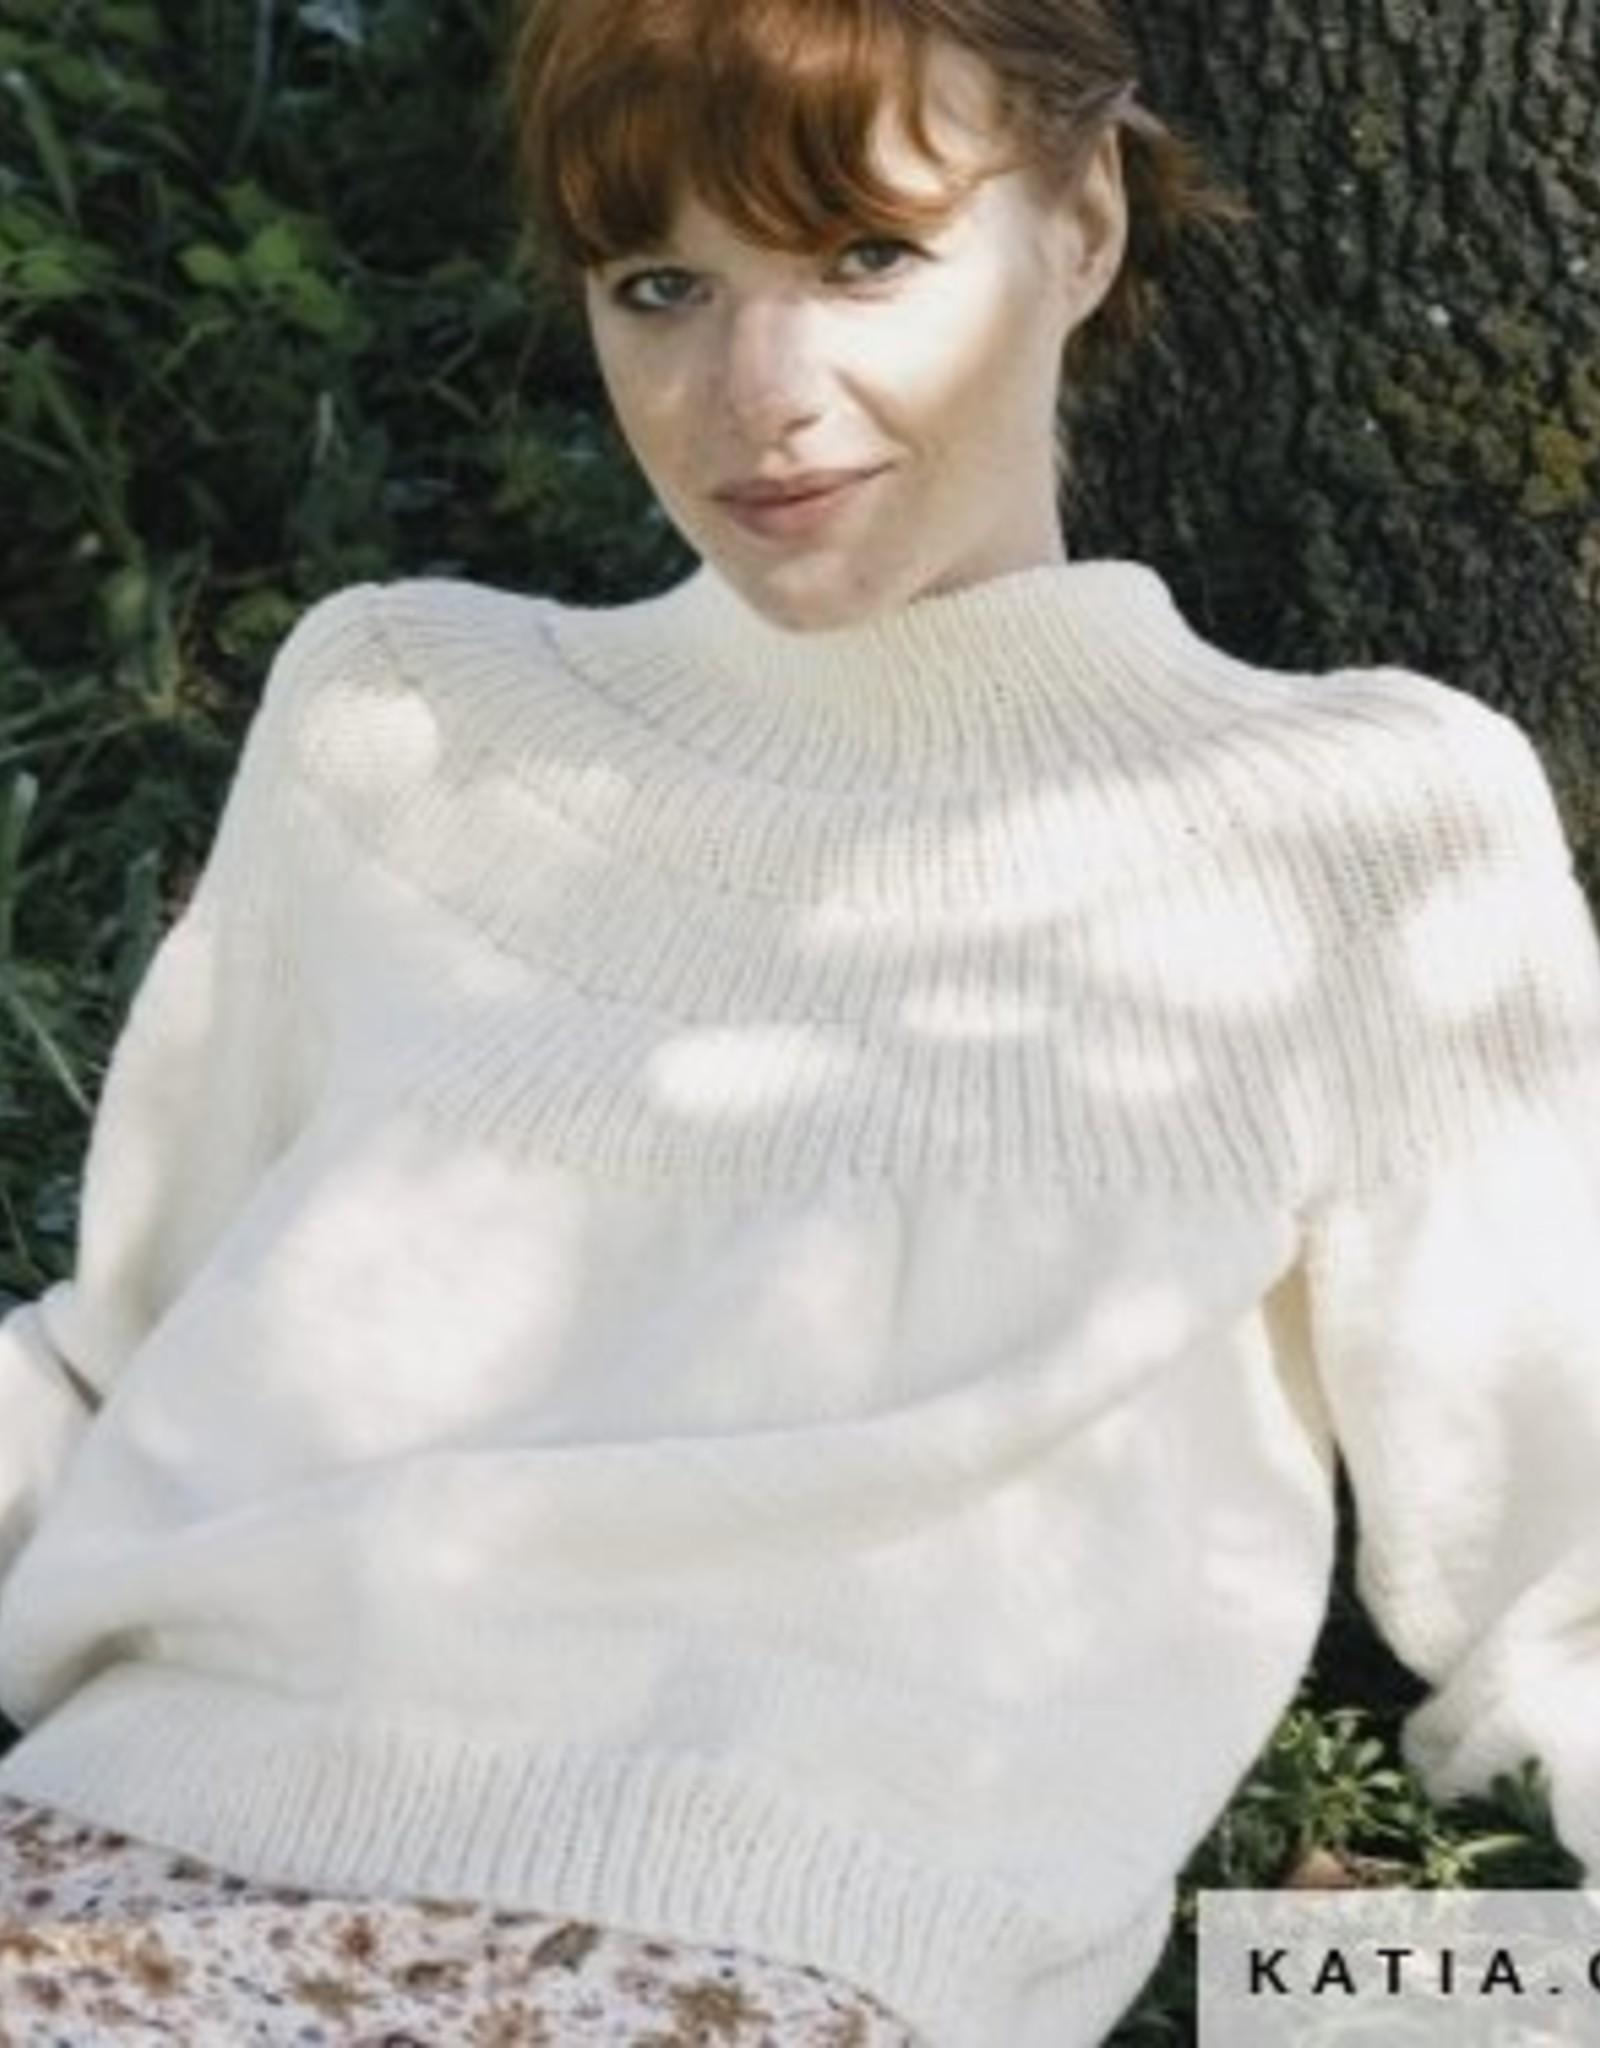 Katia Rondgebreide trui met kraag Perkins van Arles Merino